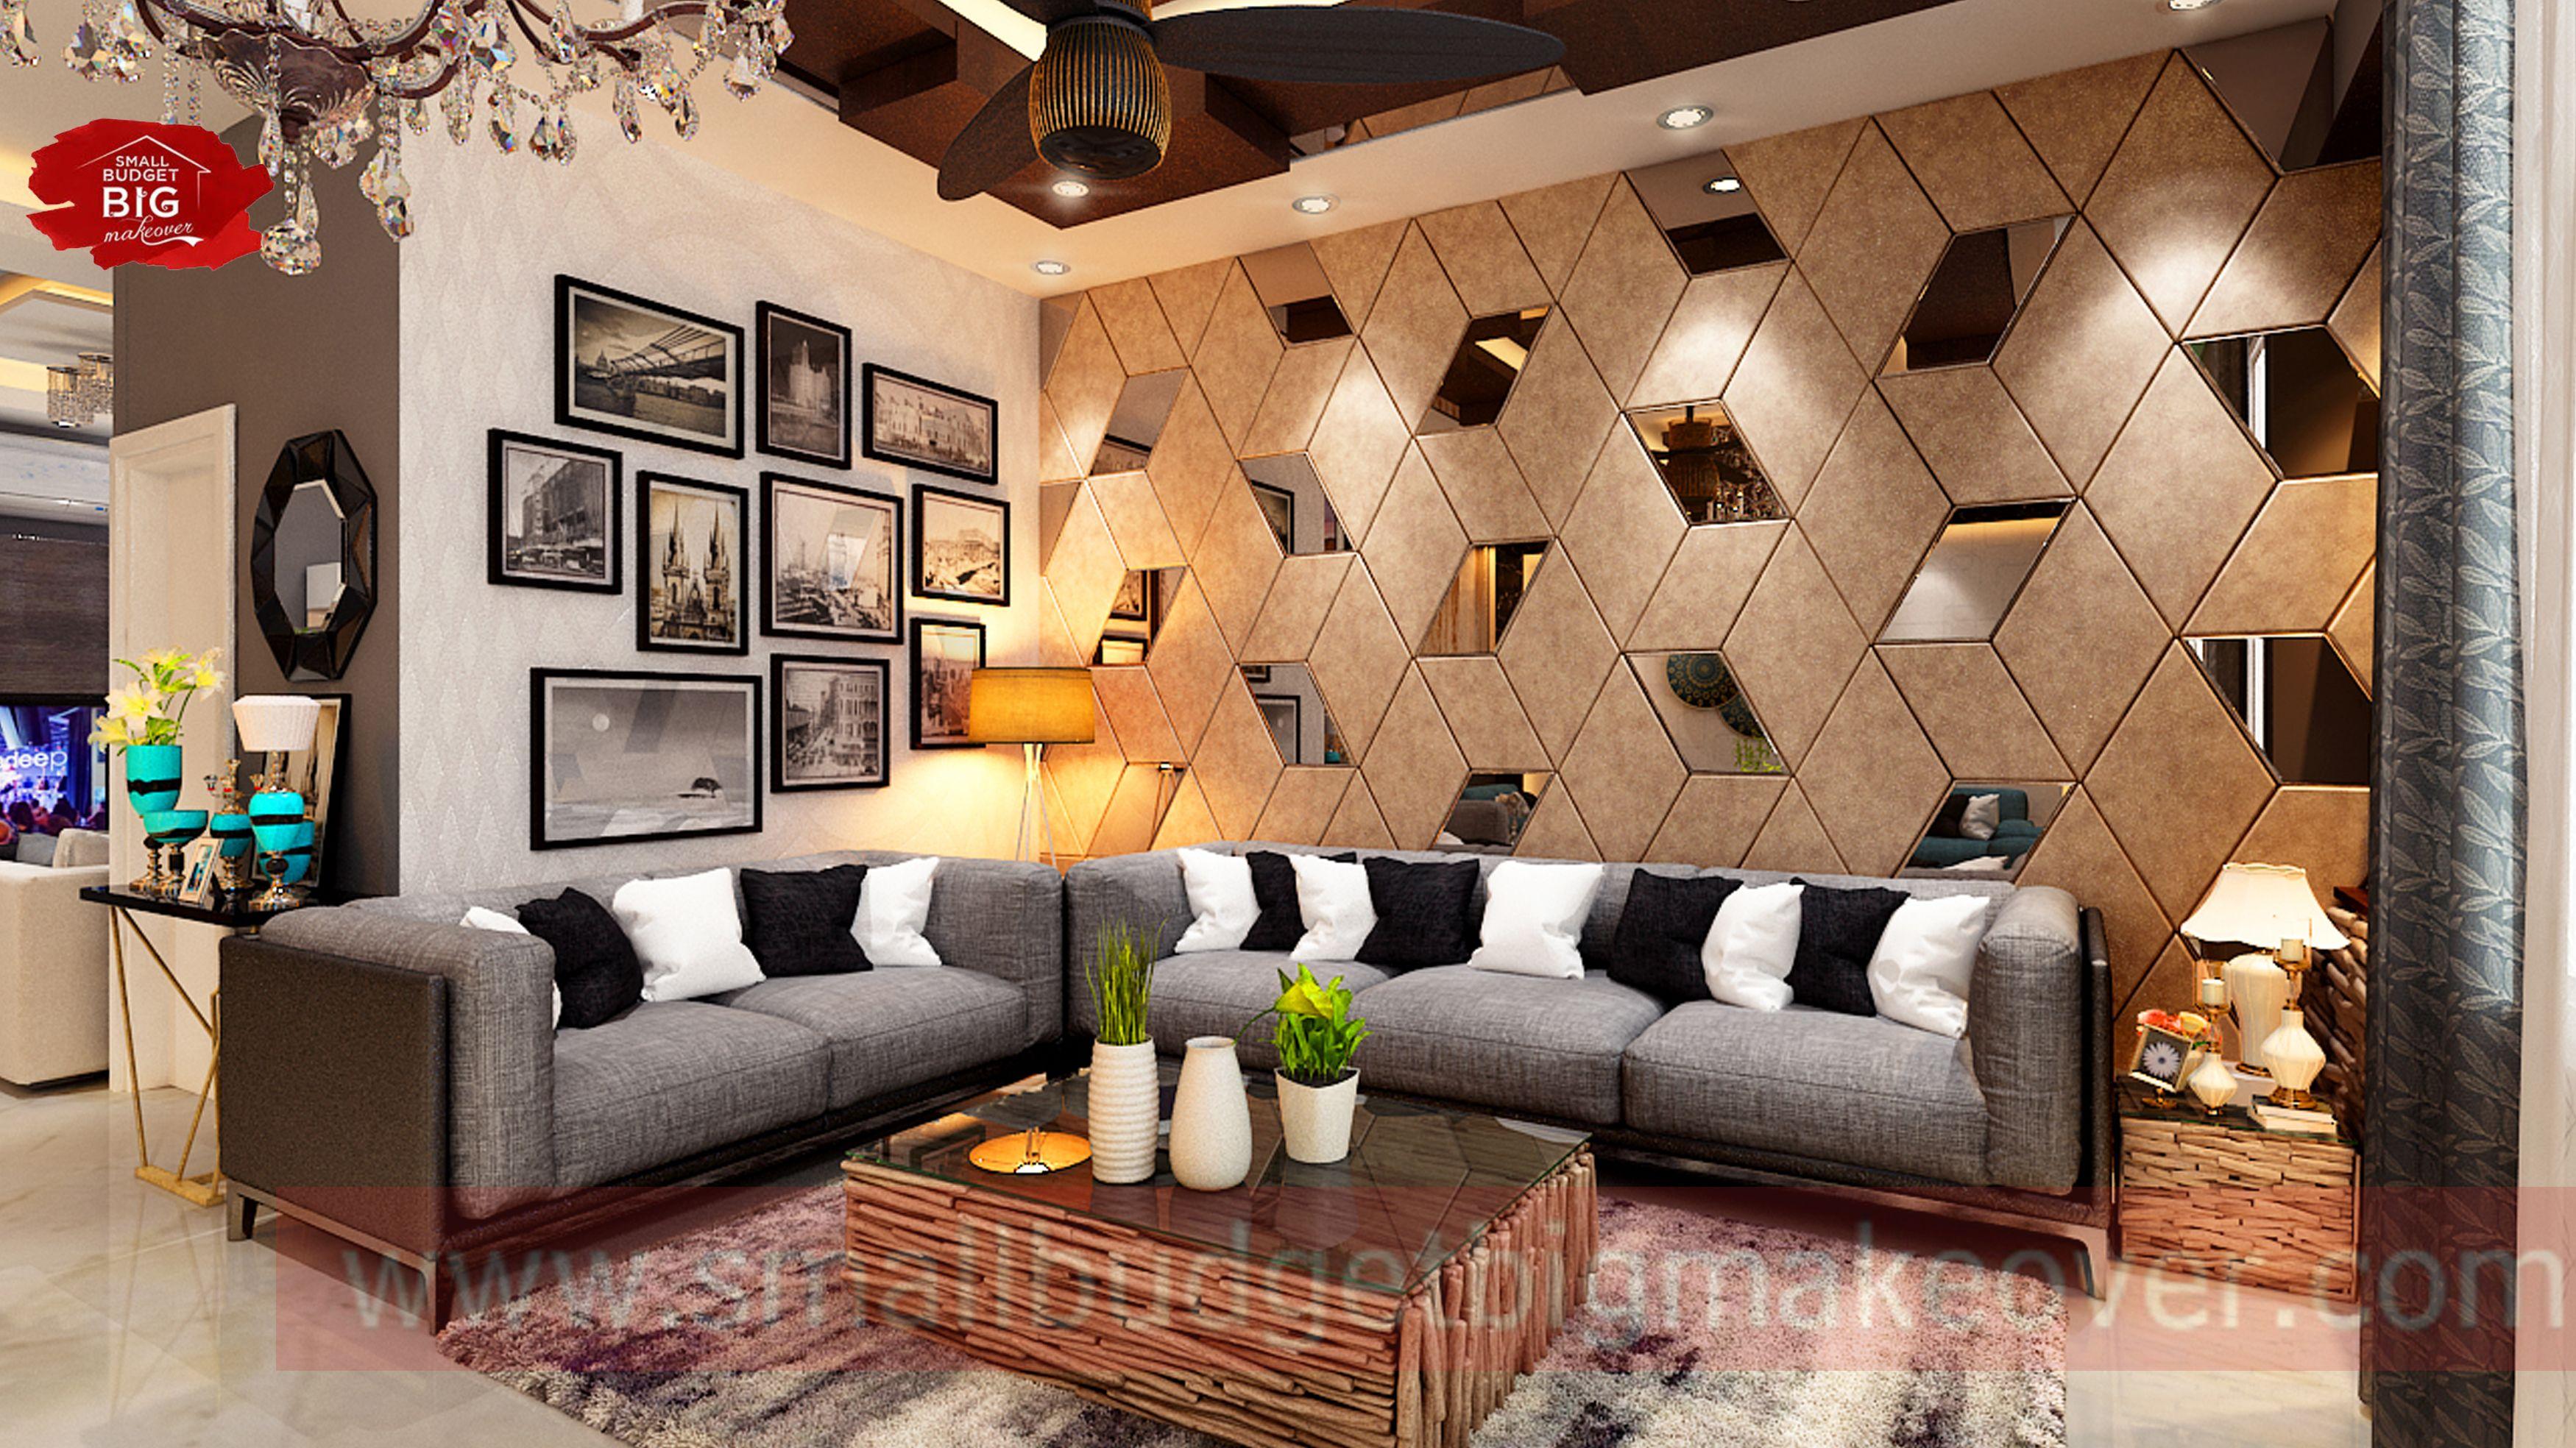 Get Beautiful Livingroomdesign Photos And Ideas By Smallbudgetbigmakeover Including Interior Designs Home Design Furnitu Room Themes Room Living Room Decor